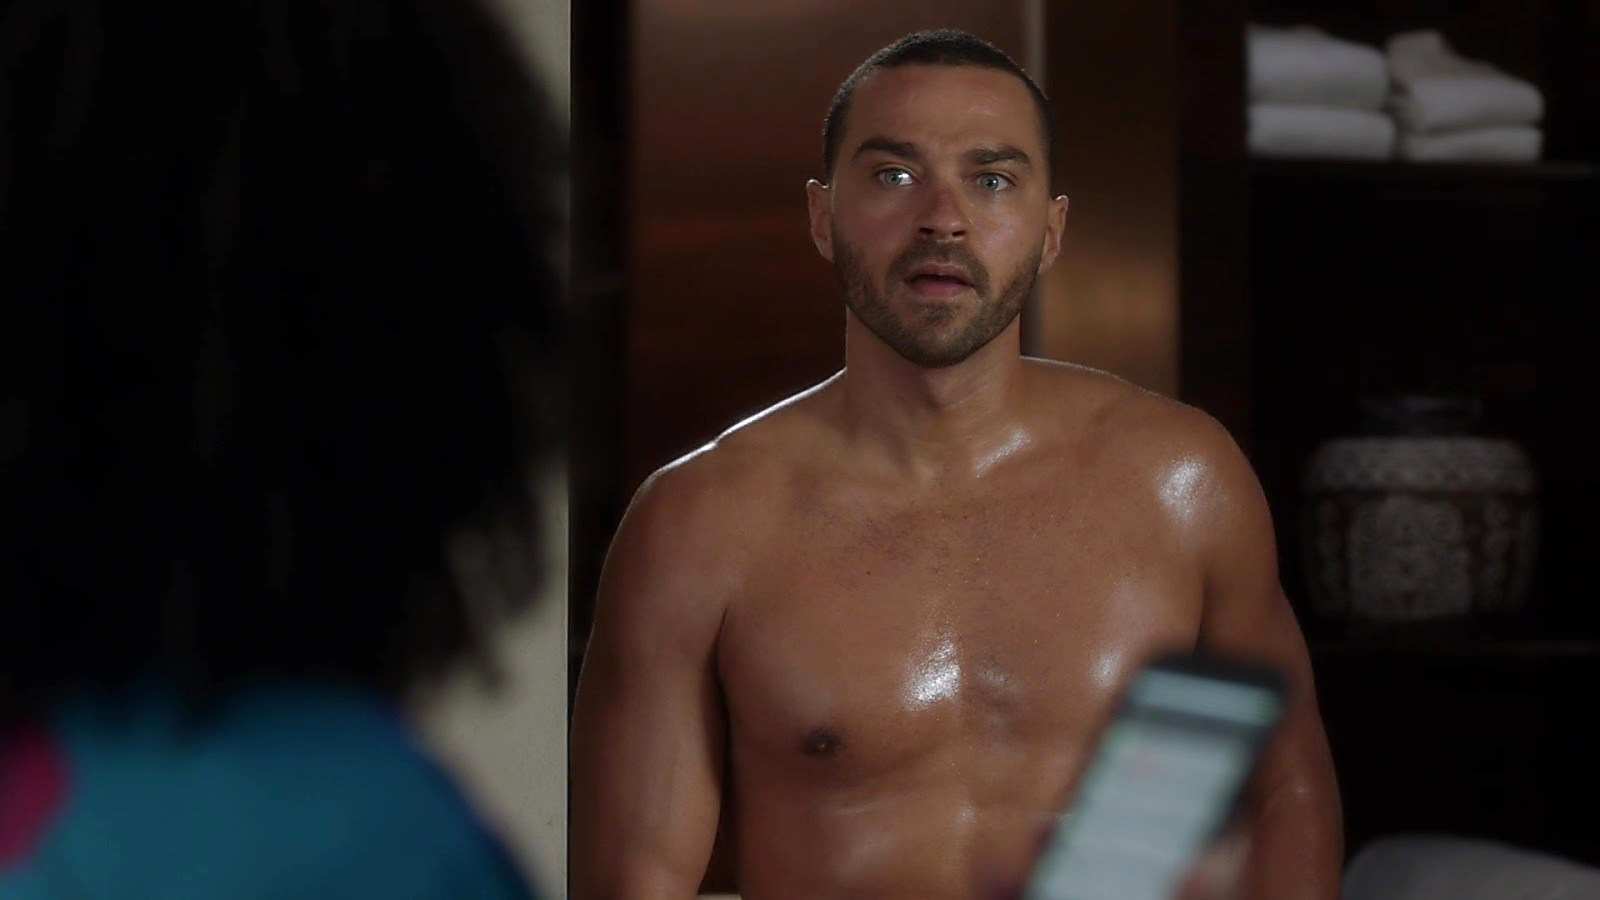 Jesse Williams sexy shirtless scene November 12, 2018, 11am